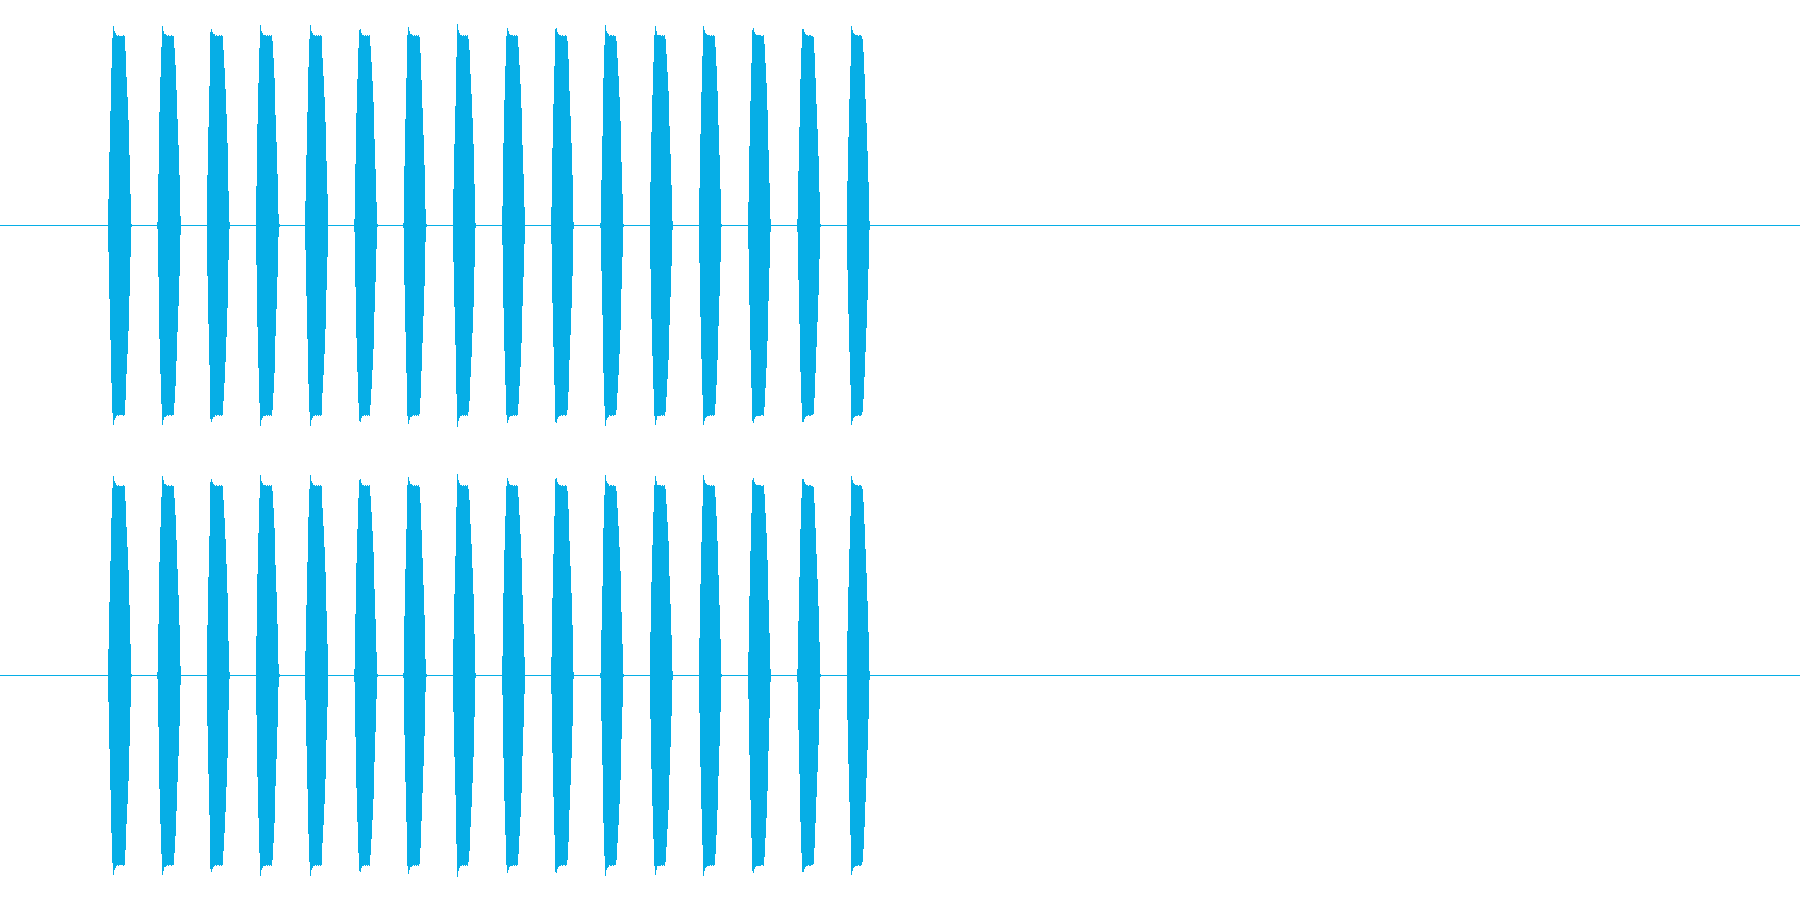 SNES-RPG01-08(メッセージ)の再生済みの波形